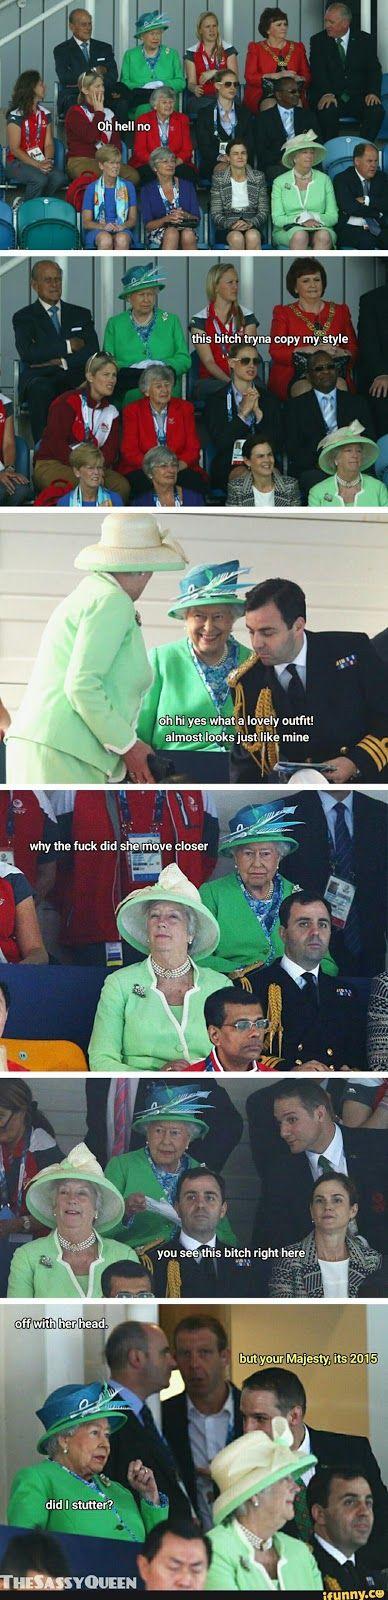 Funny Queen Elizabeth Off With Her Head!